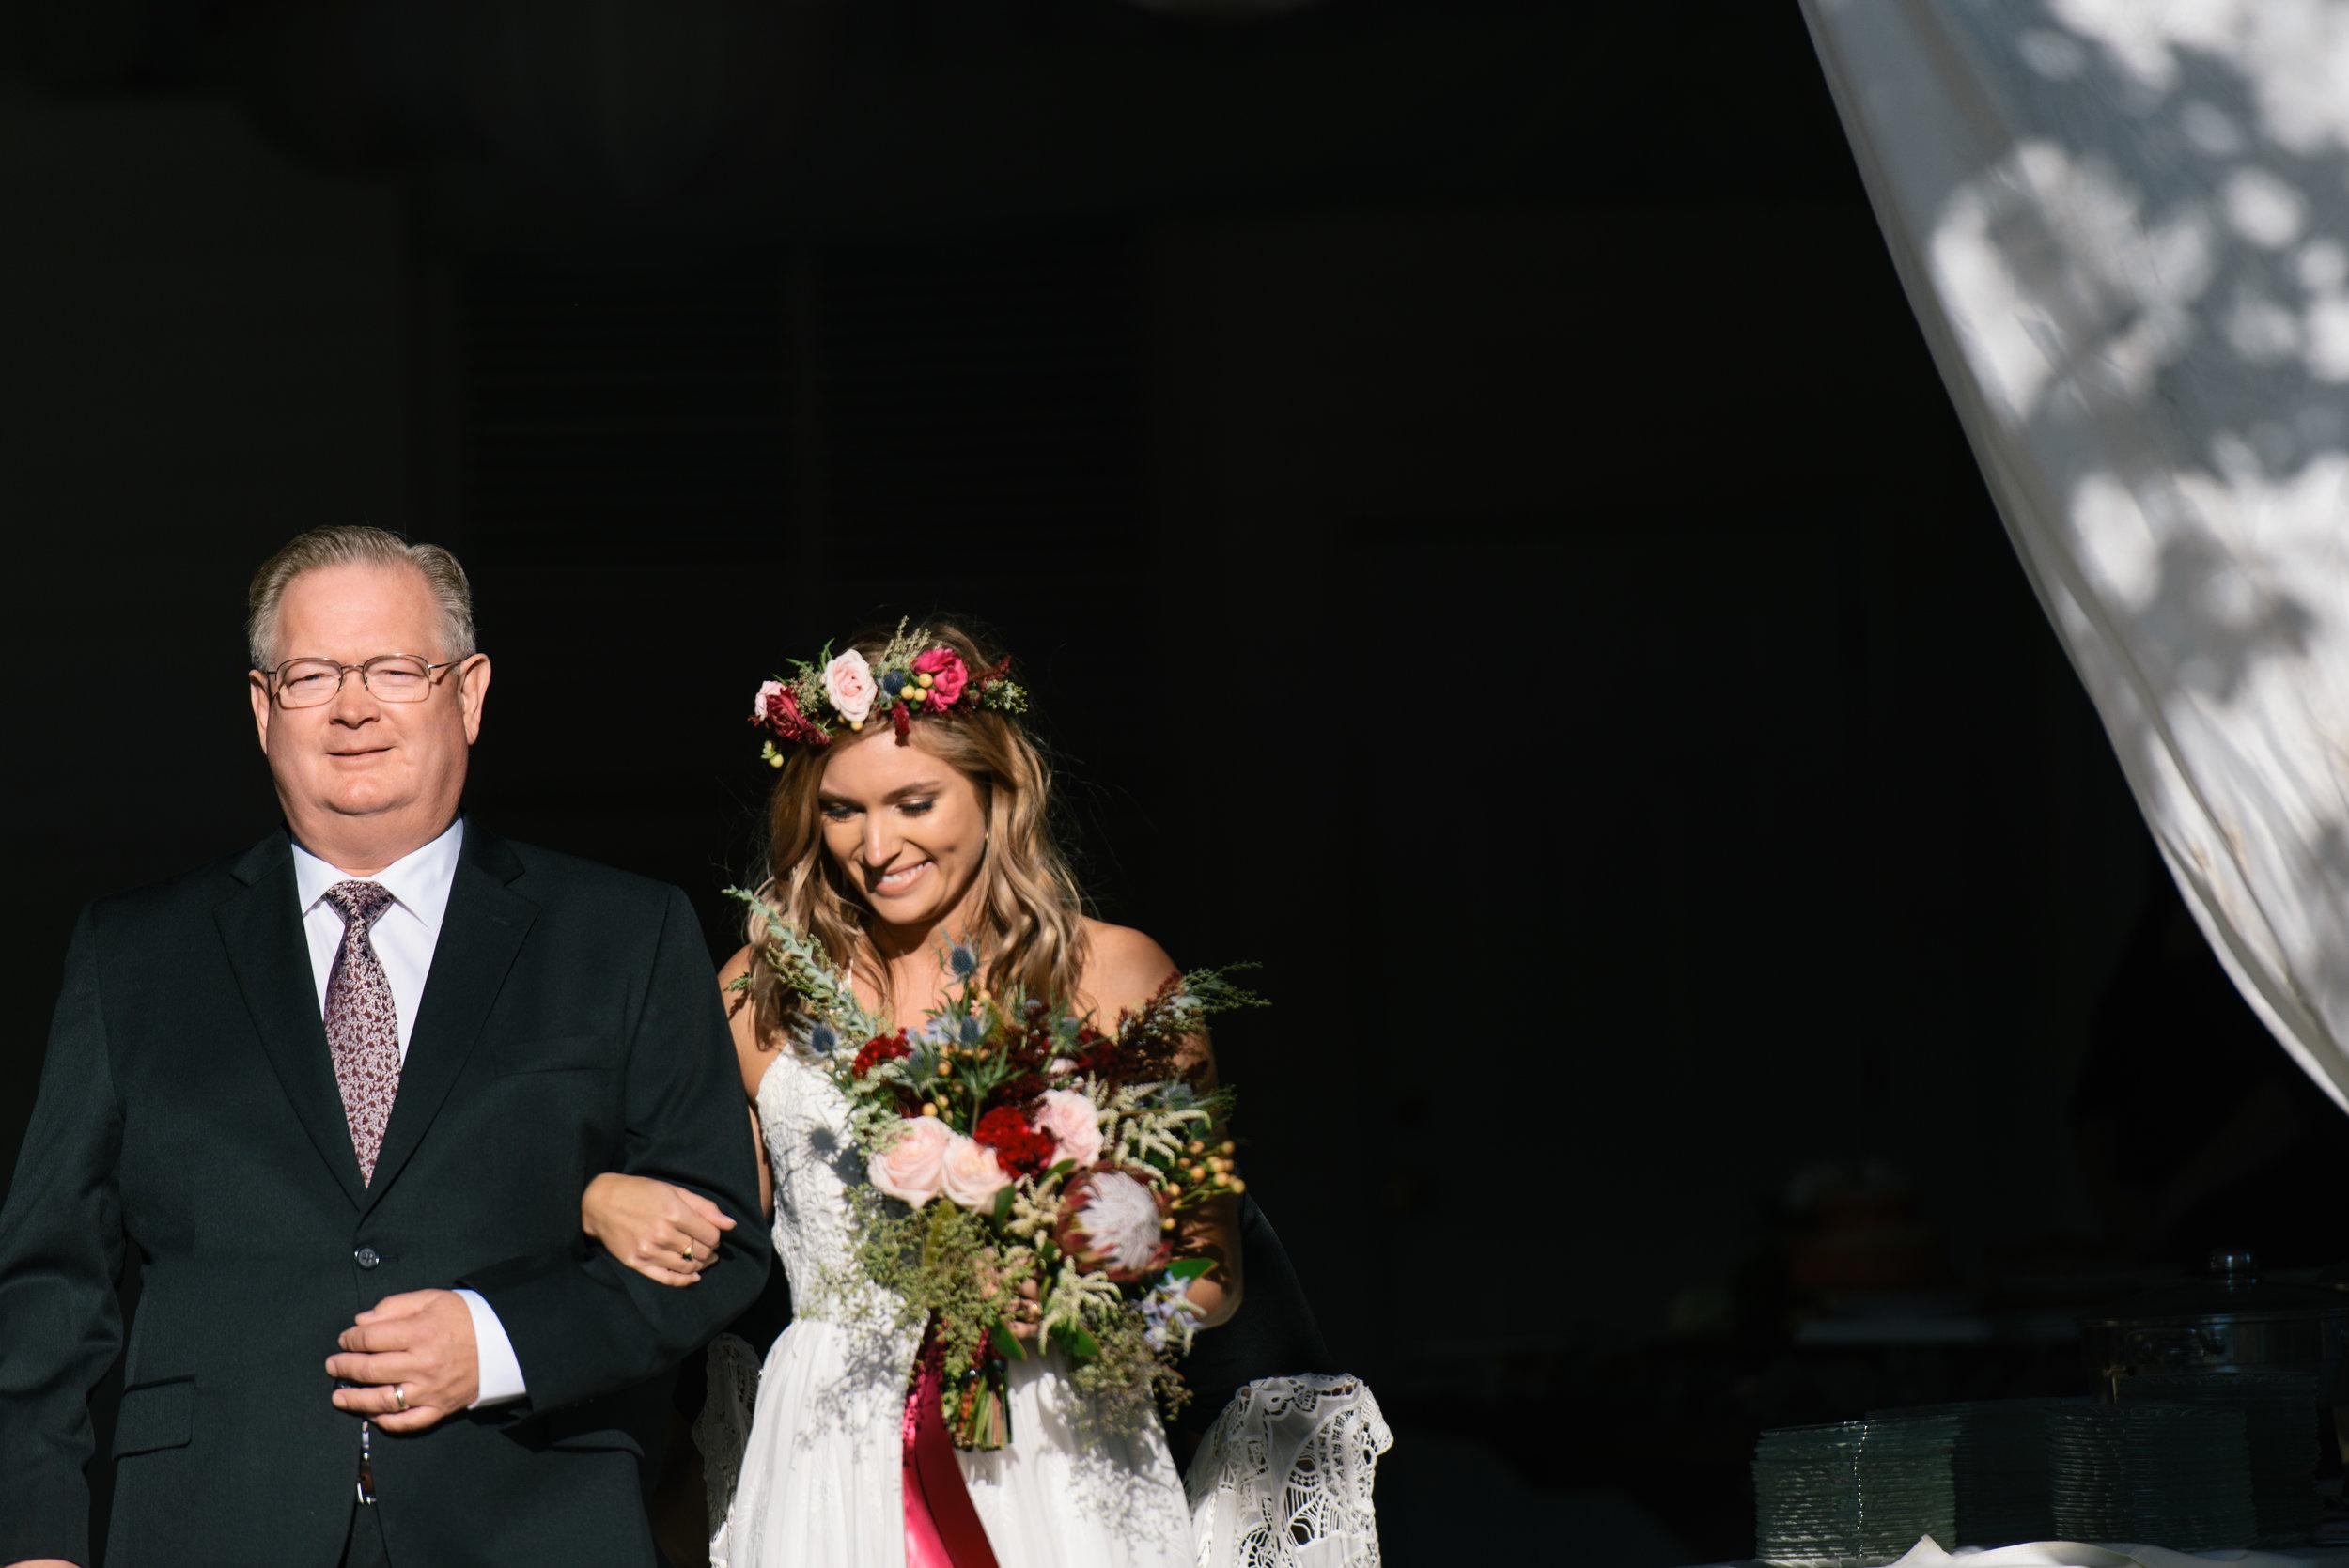 kristin-and-peter-atlanta-georgia-wedding-october-8th-2016 (369 of 1068).jpg